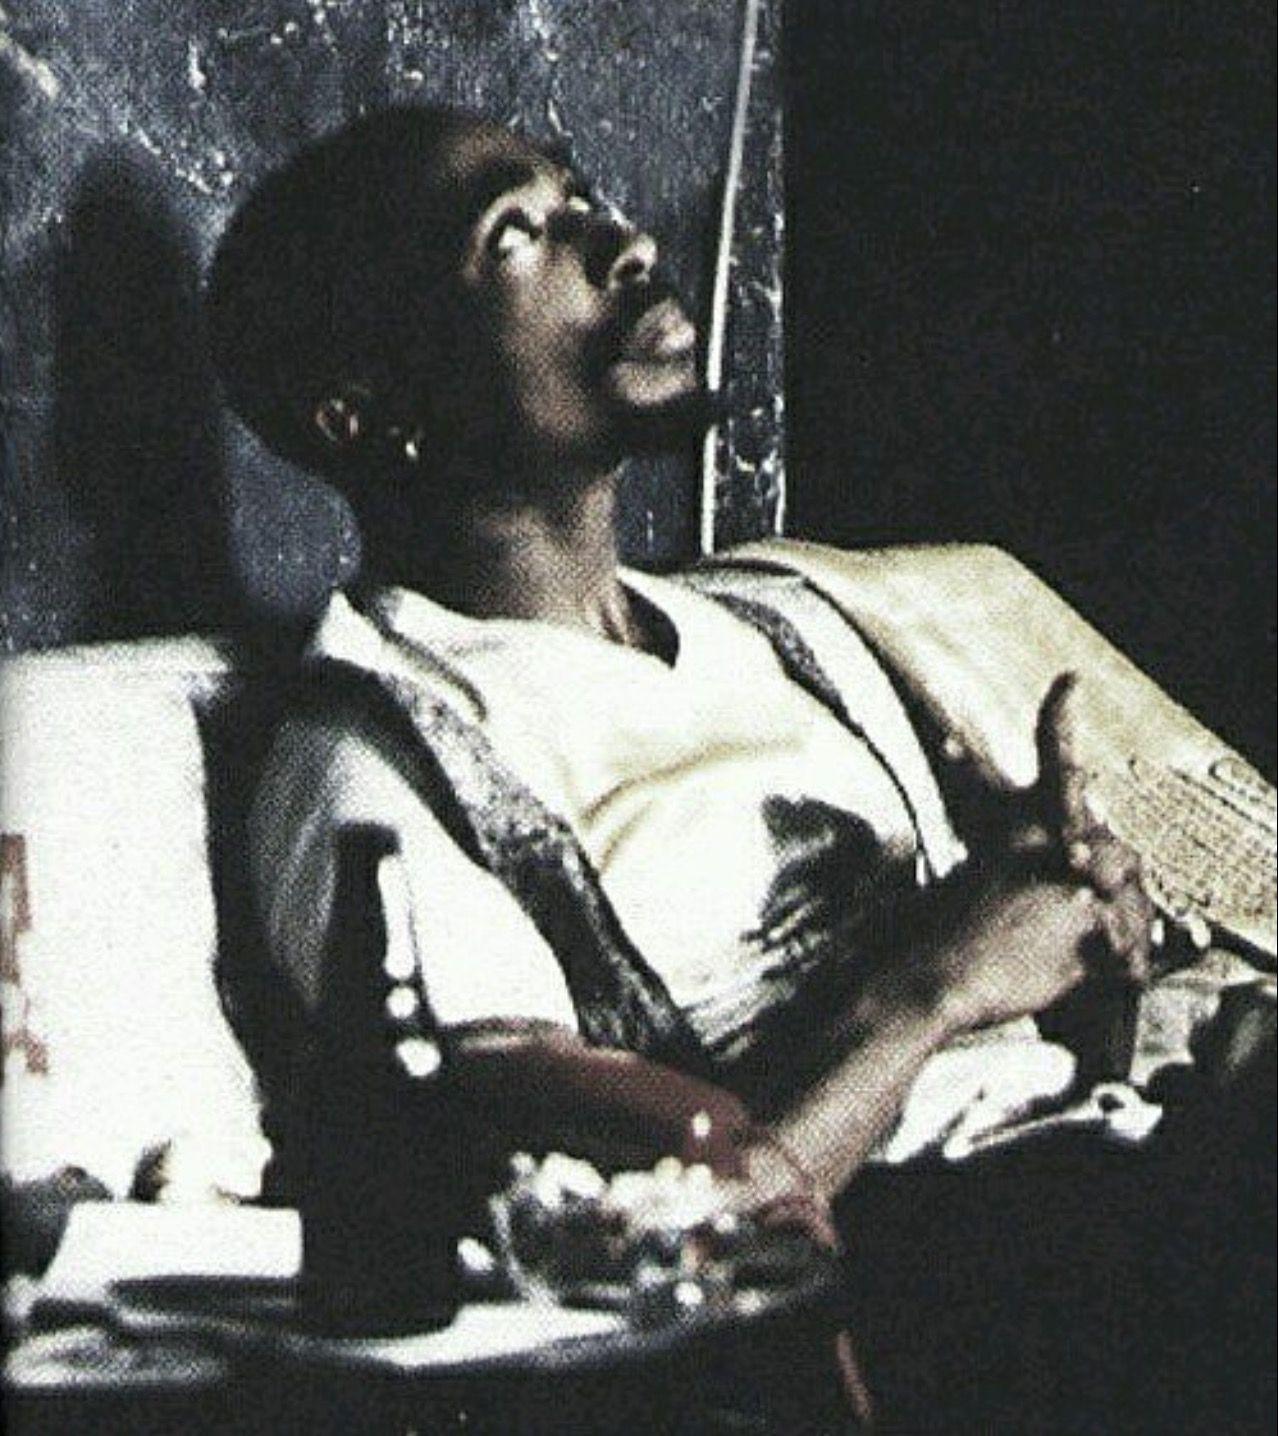 Tupac Shakur 2Pac Rapper Music Fabric Poster 12x12 24x24 27x27 B-127